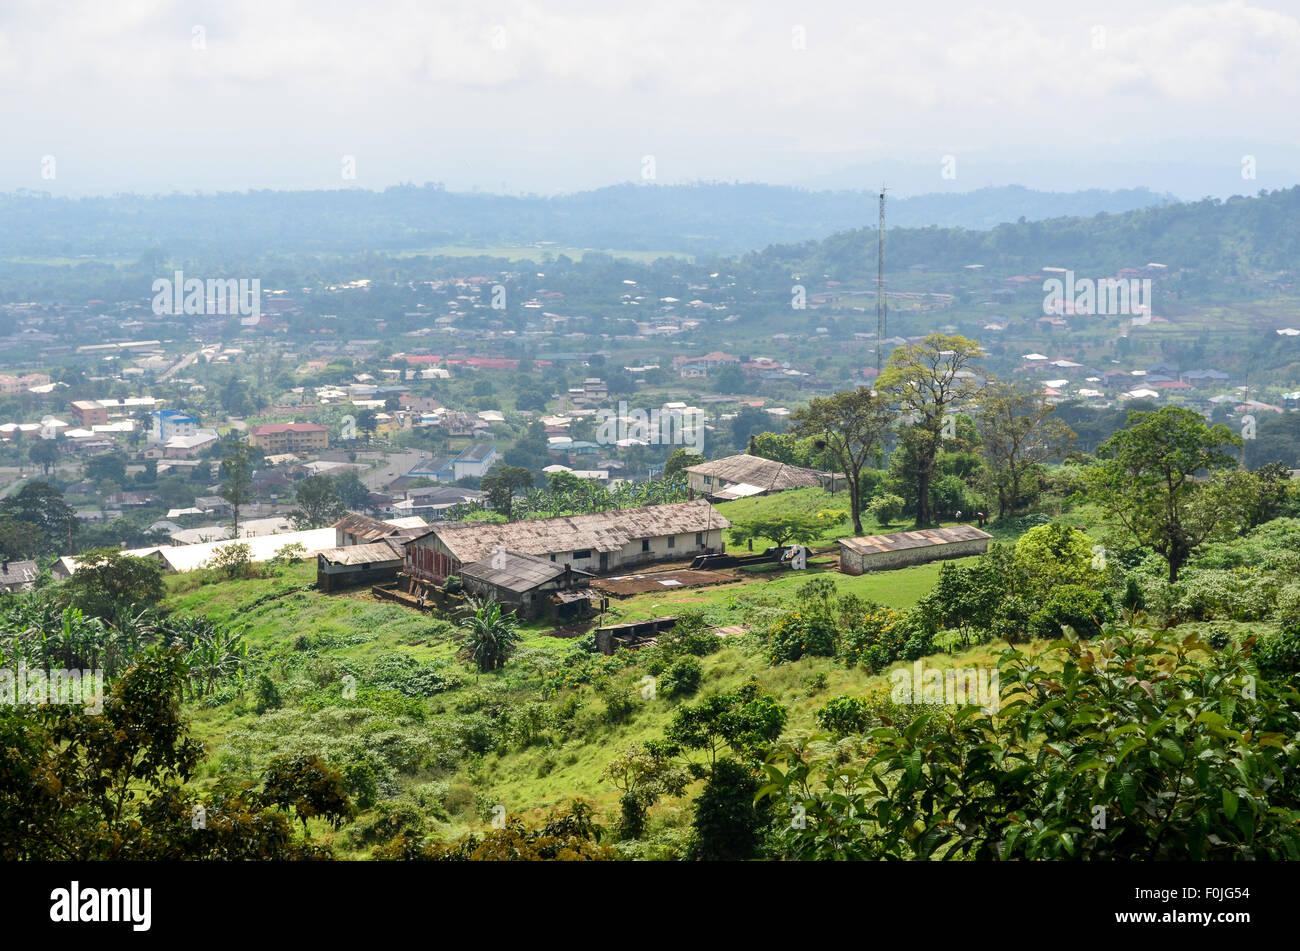 Buea, Cameroon - Stock Image